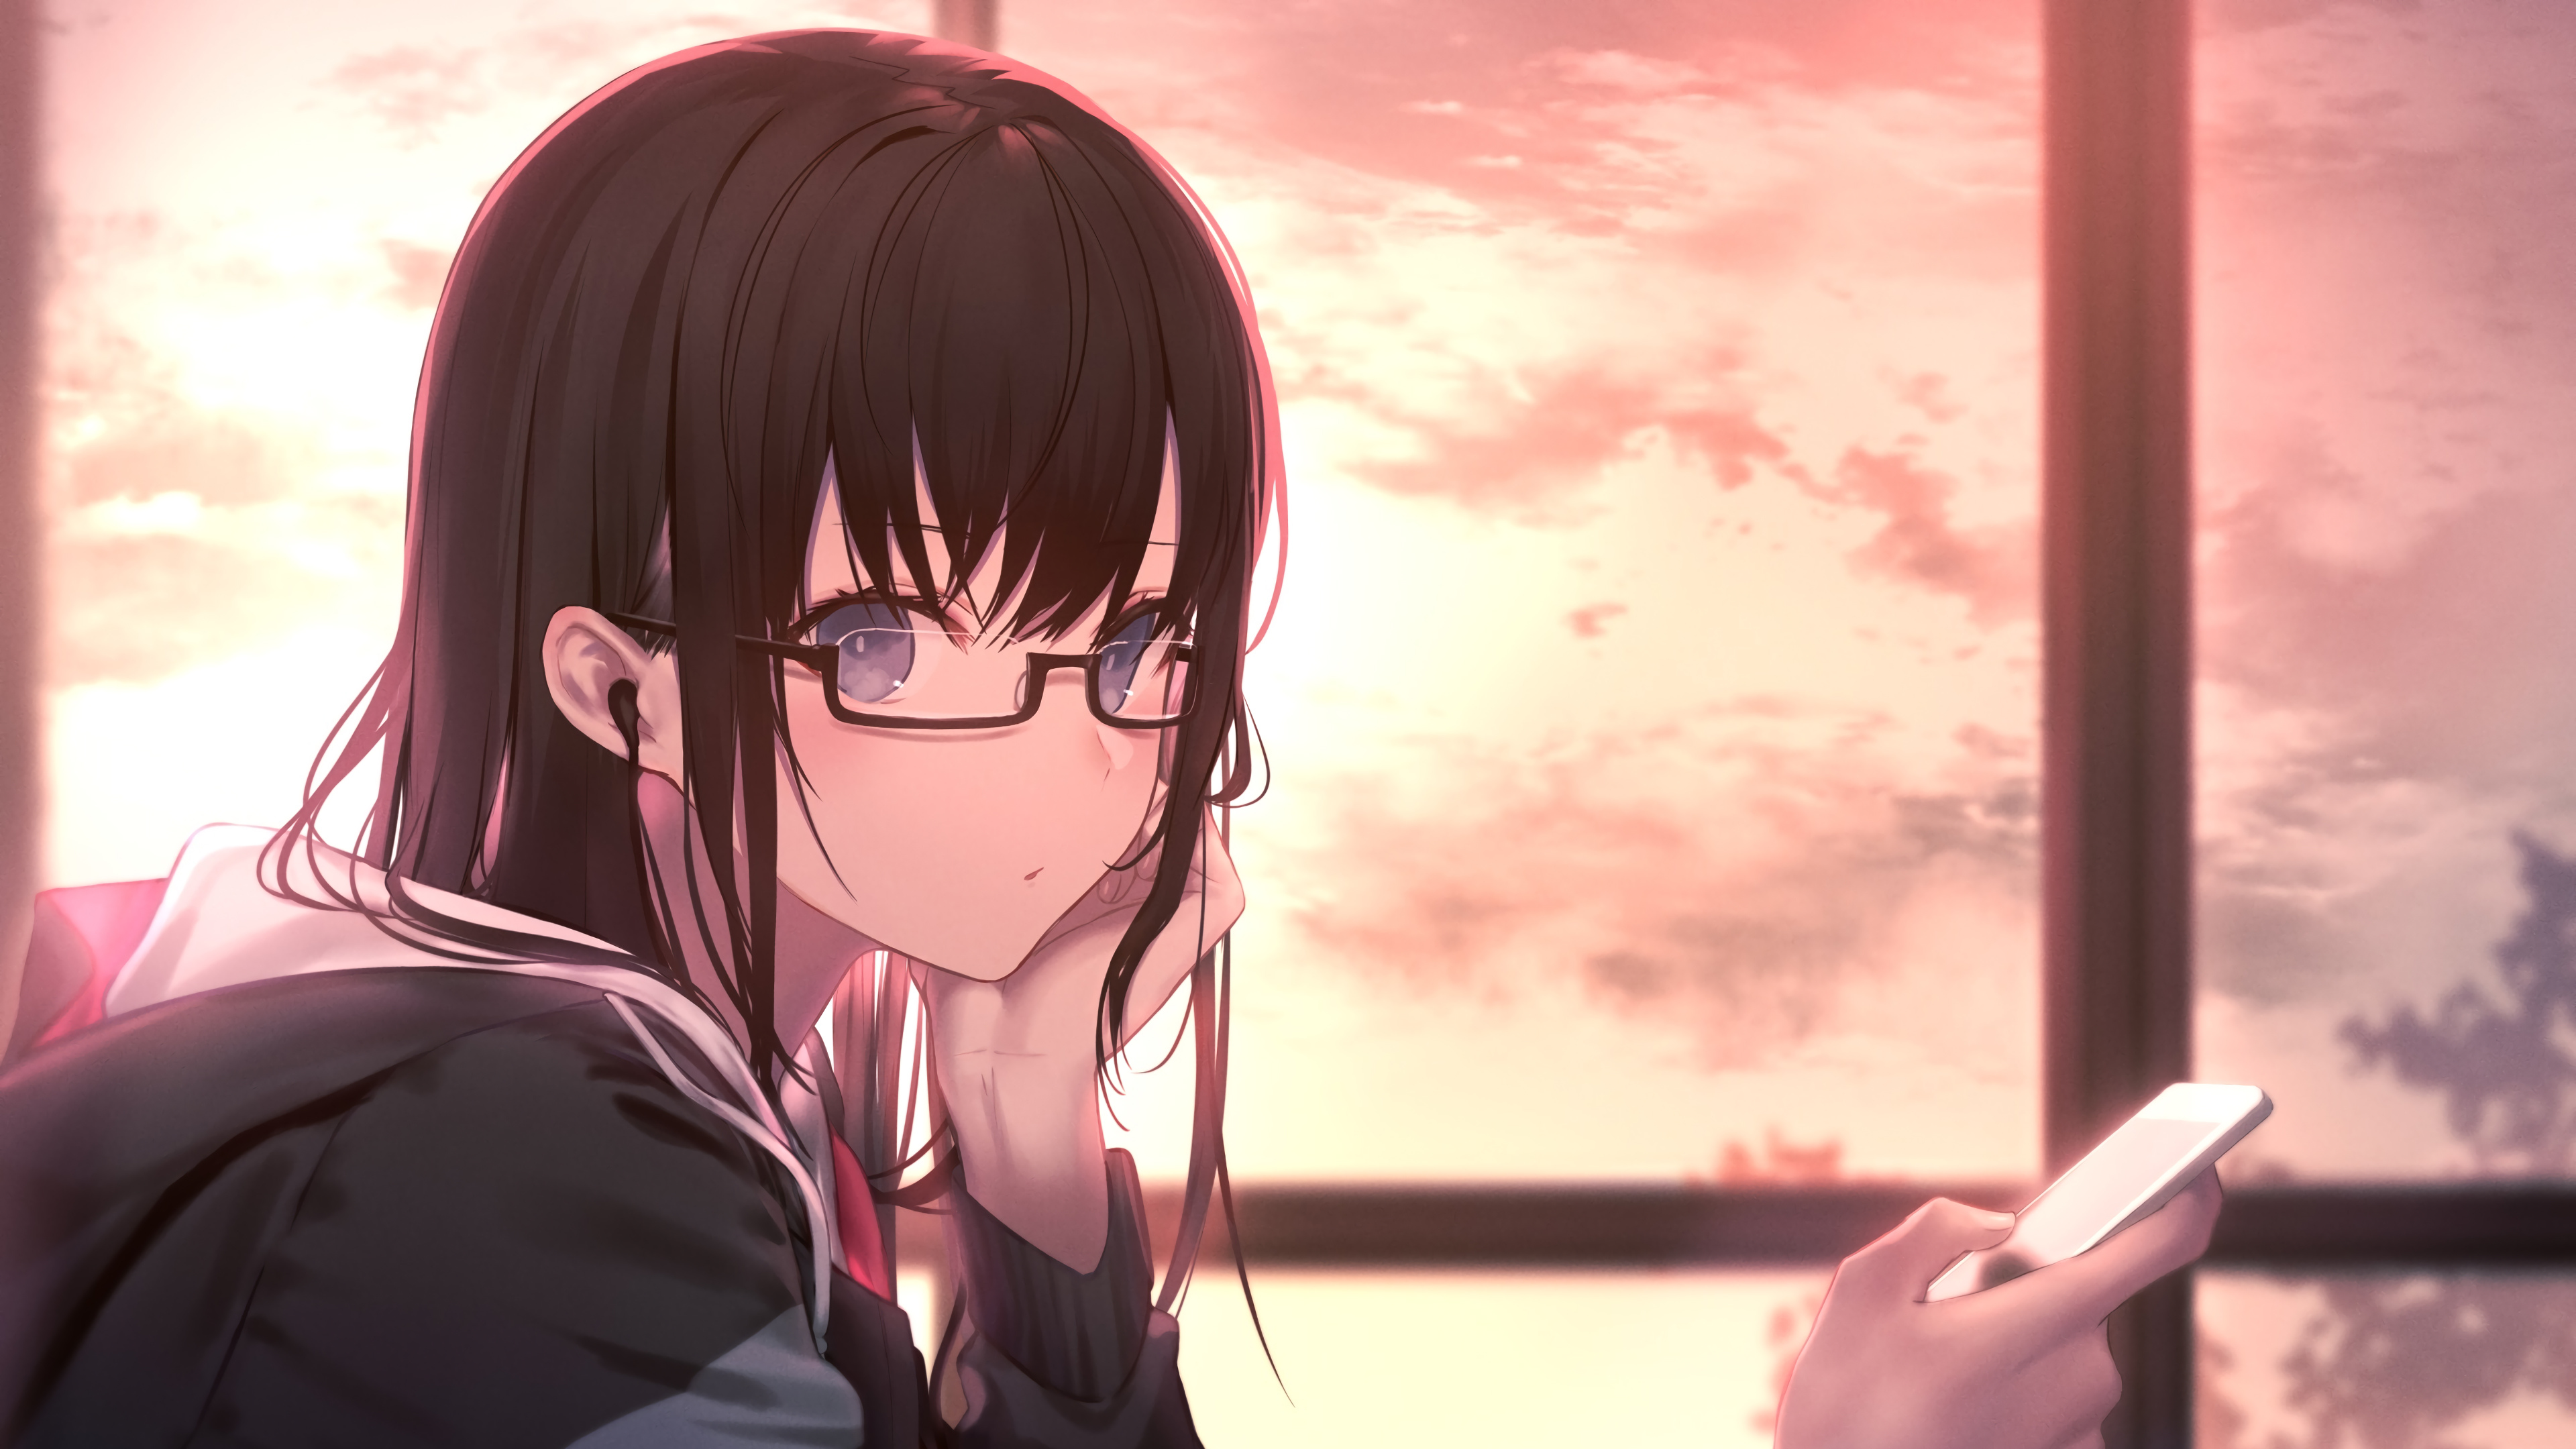 Fondos de pantalla Anime Chica de Gafas con Uniforme de Estudiante